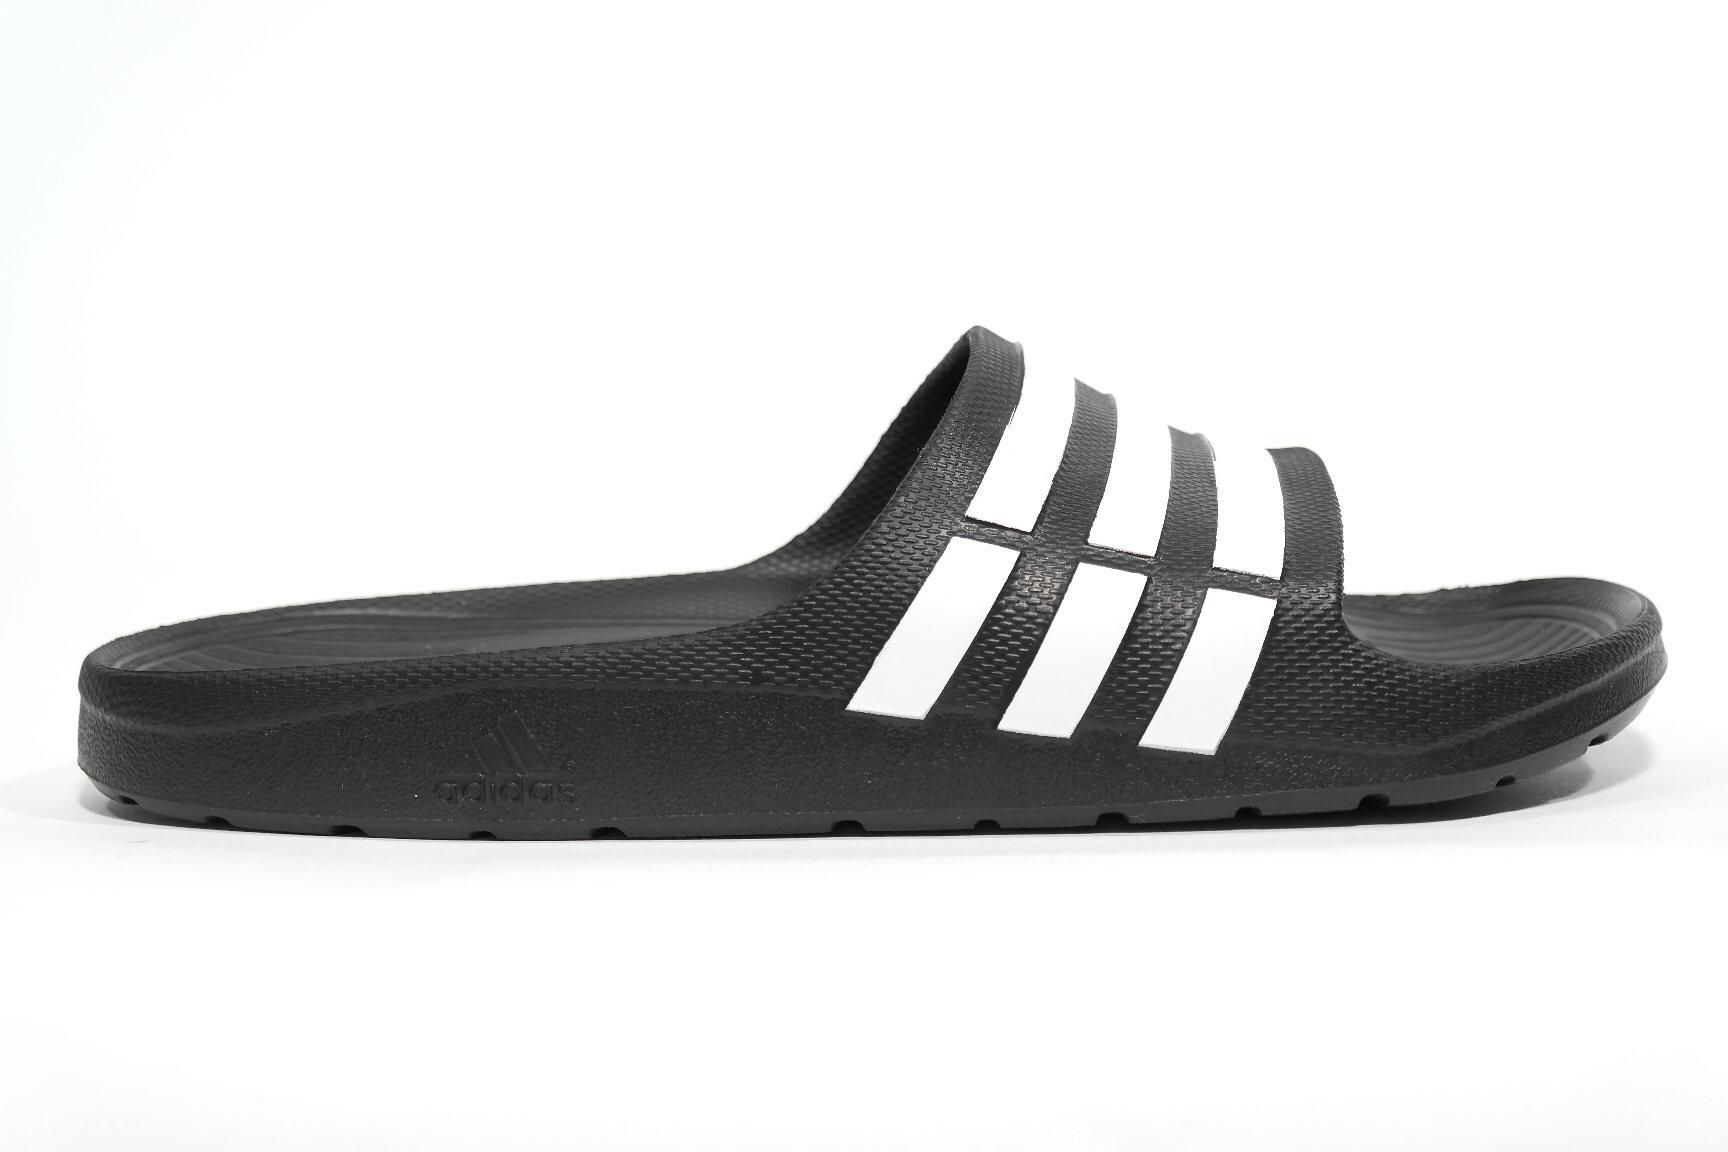 Adidas Duramo Badslippers